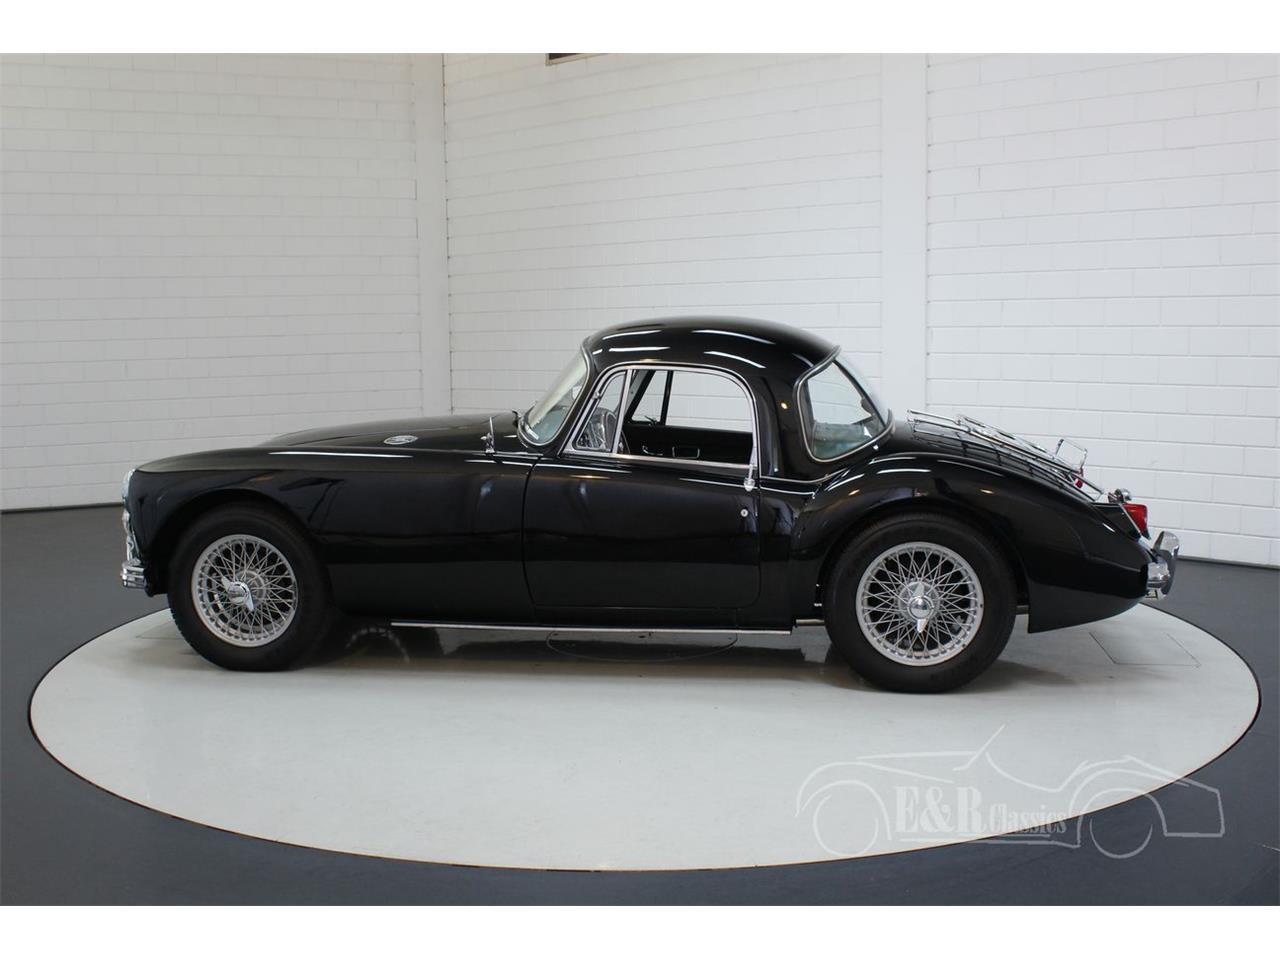 1957 MG MGA 1500 (CC-1385165) for sale in Waalwijk, Noord-Brabant